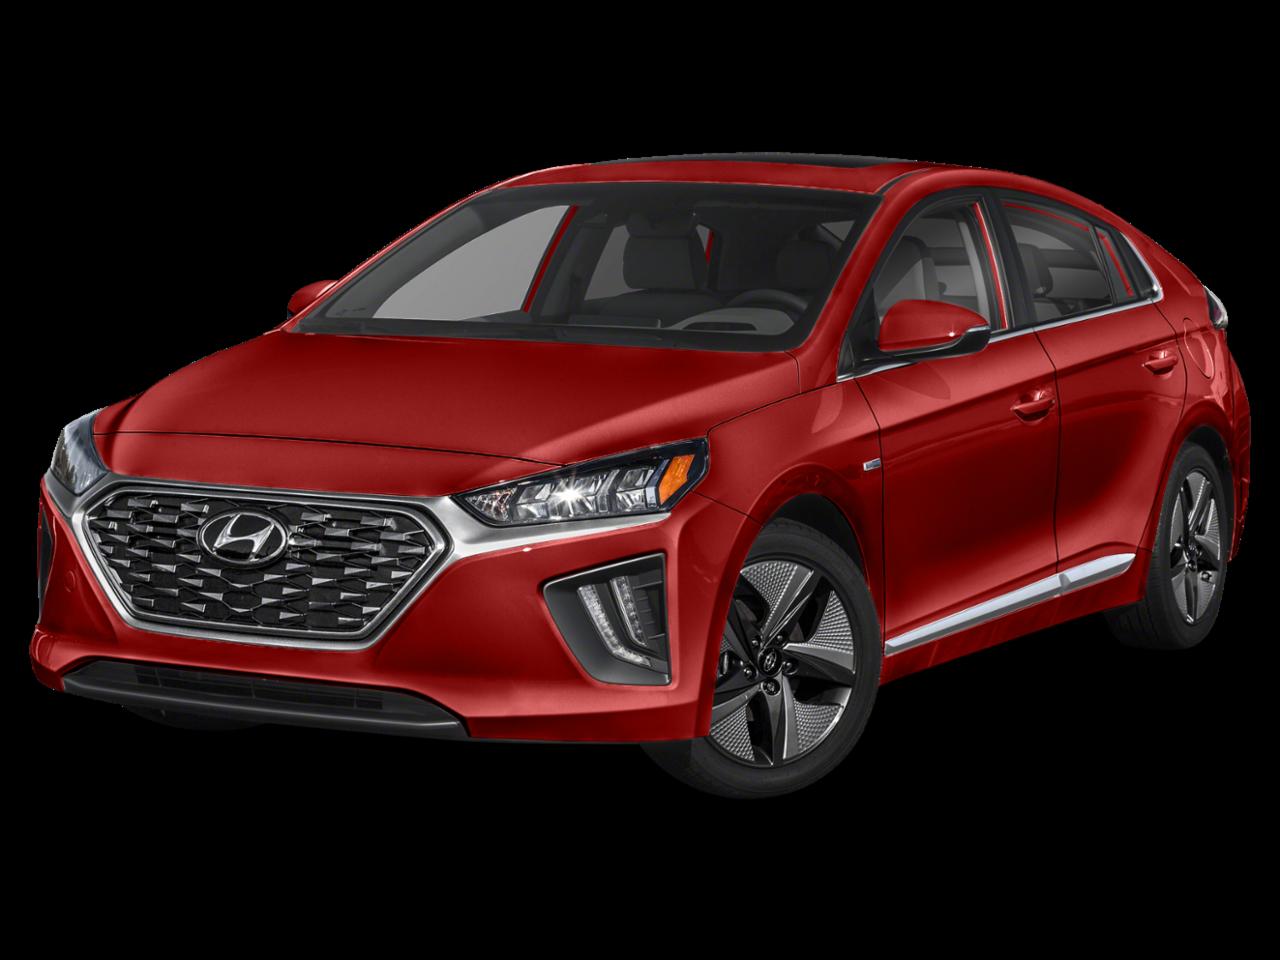 Hyundai 2021 IONIQ Hybrid Limited